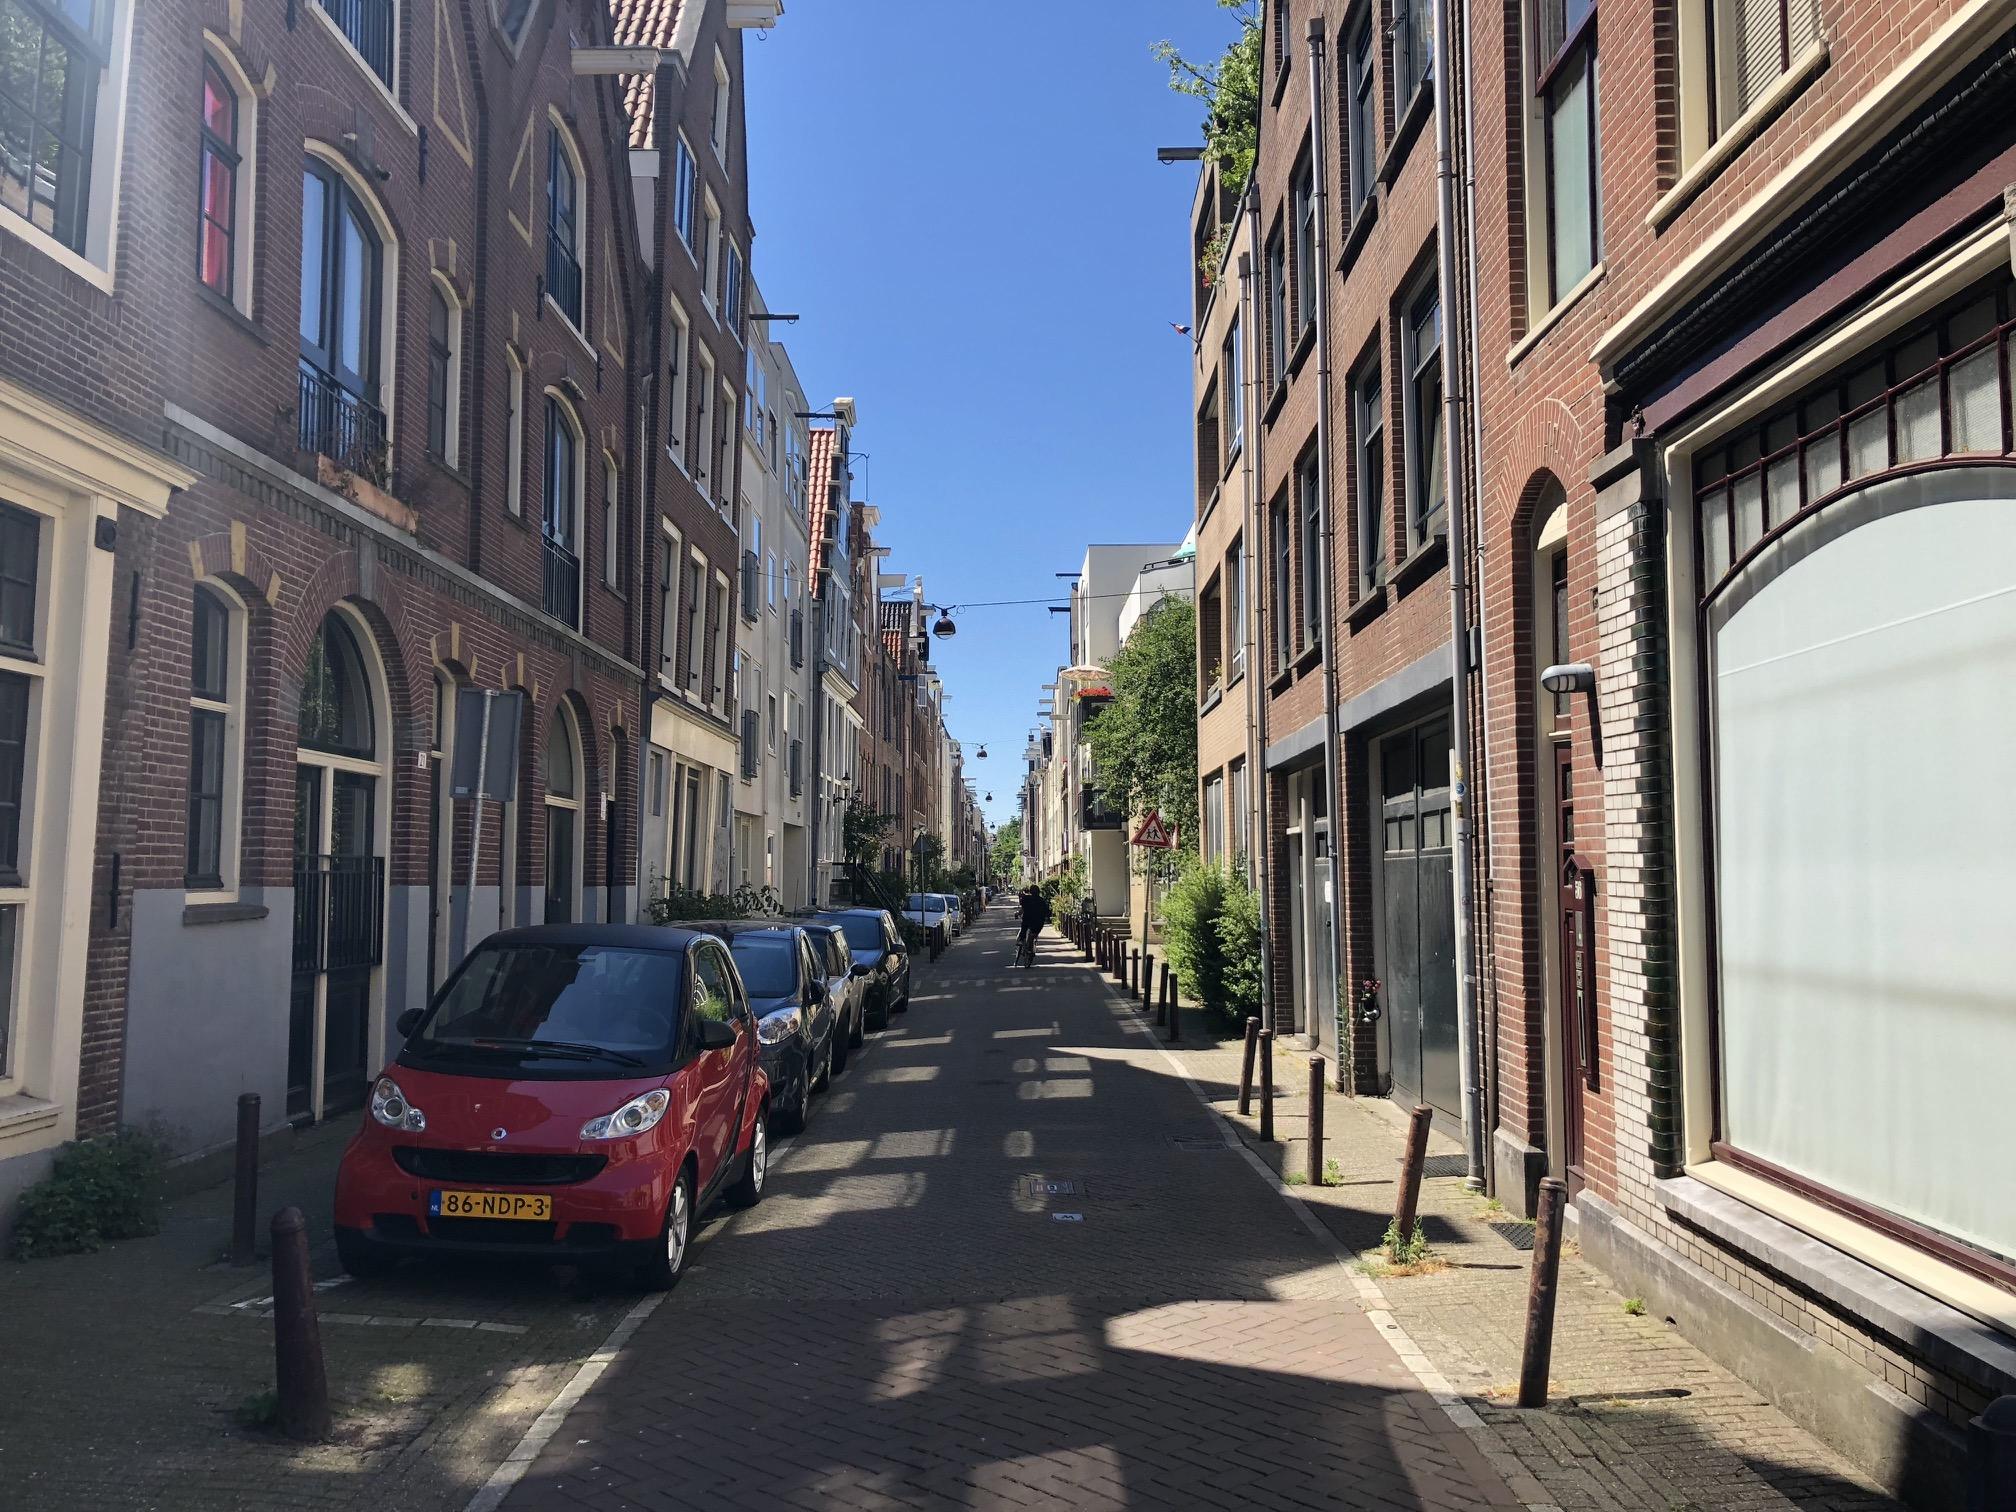 Rua em Amsterdã